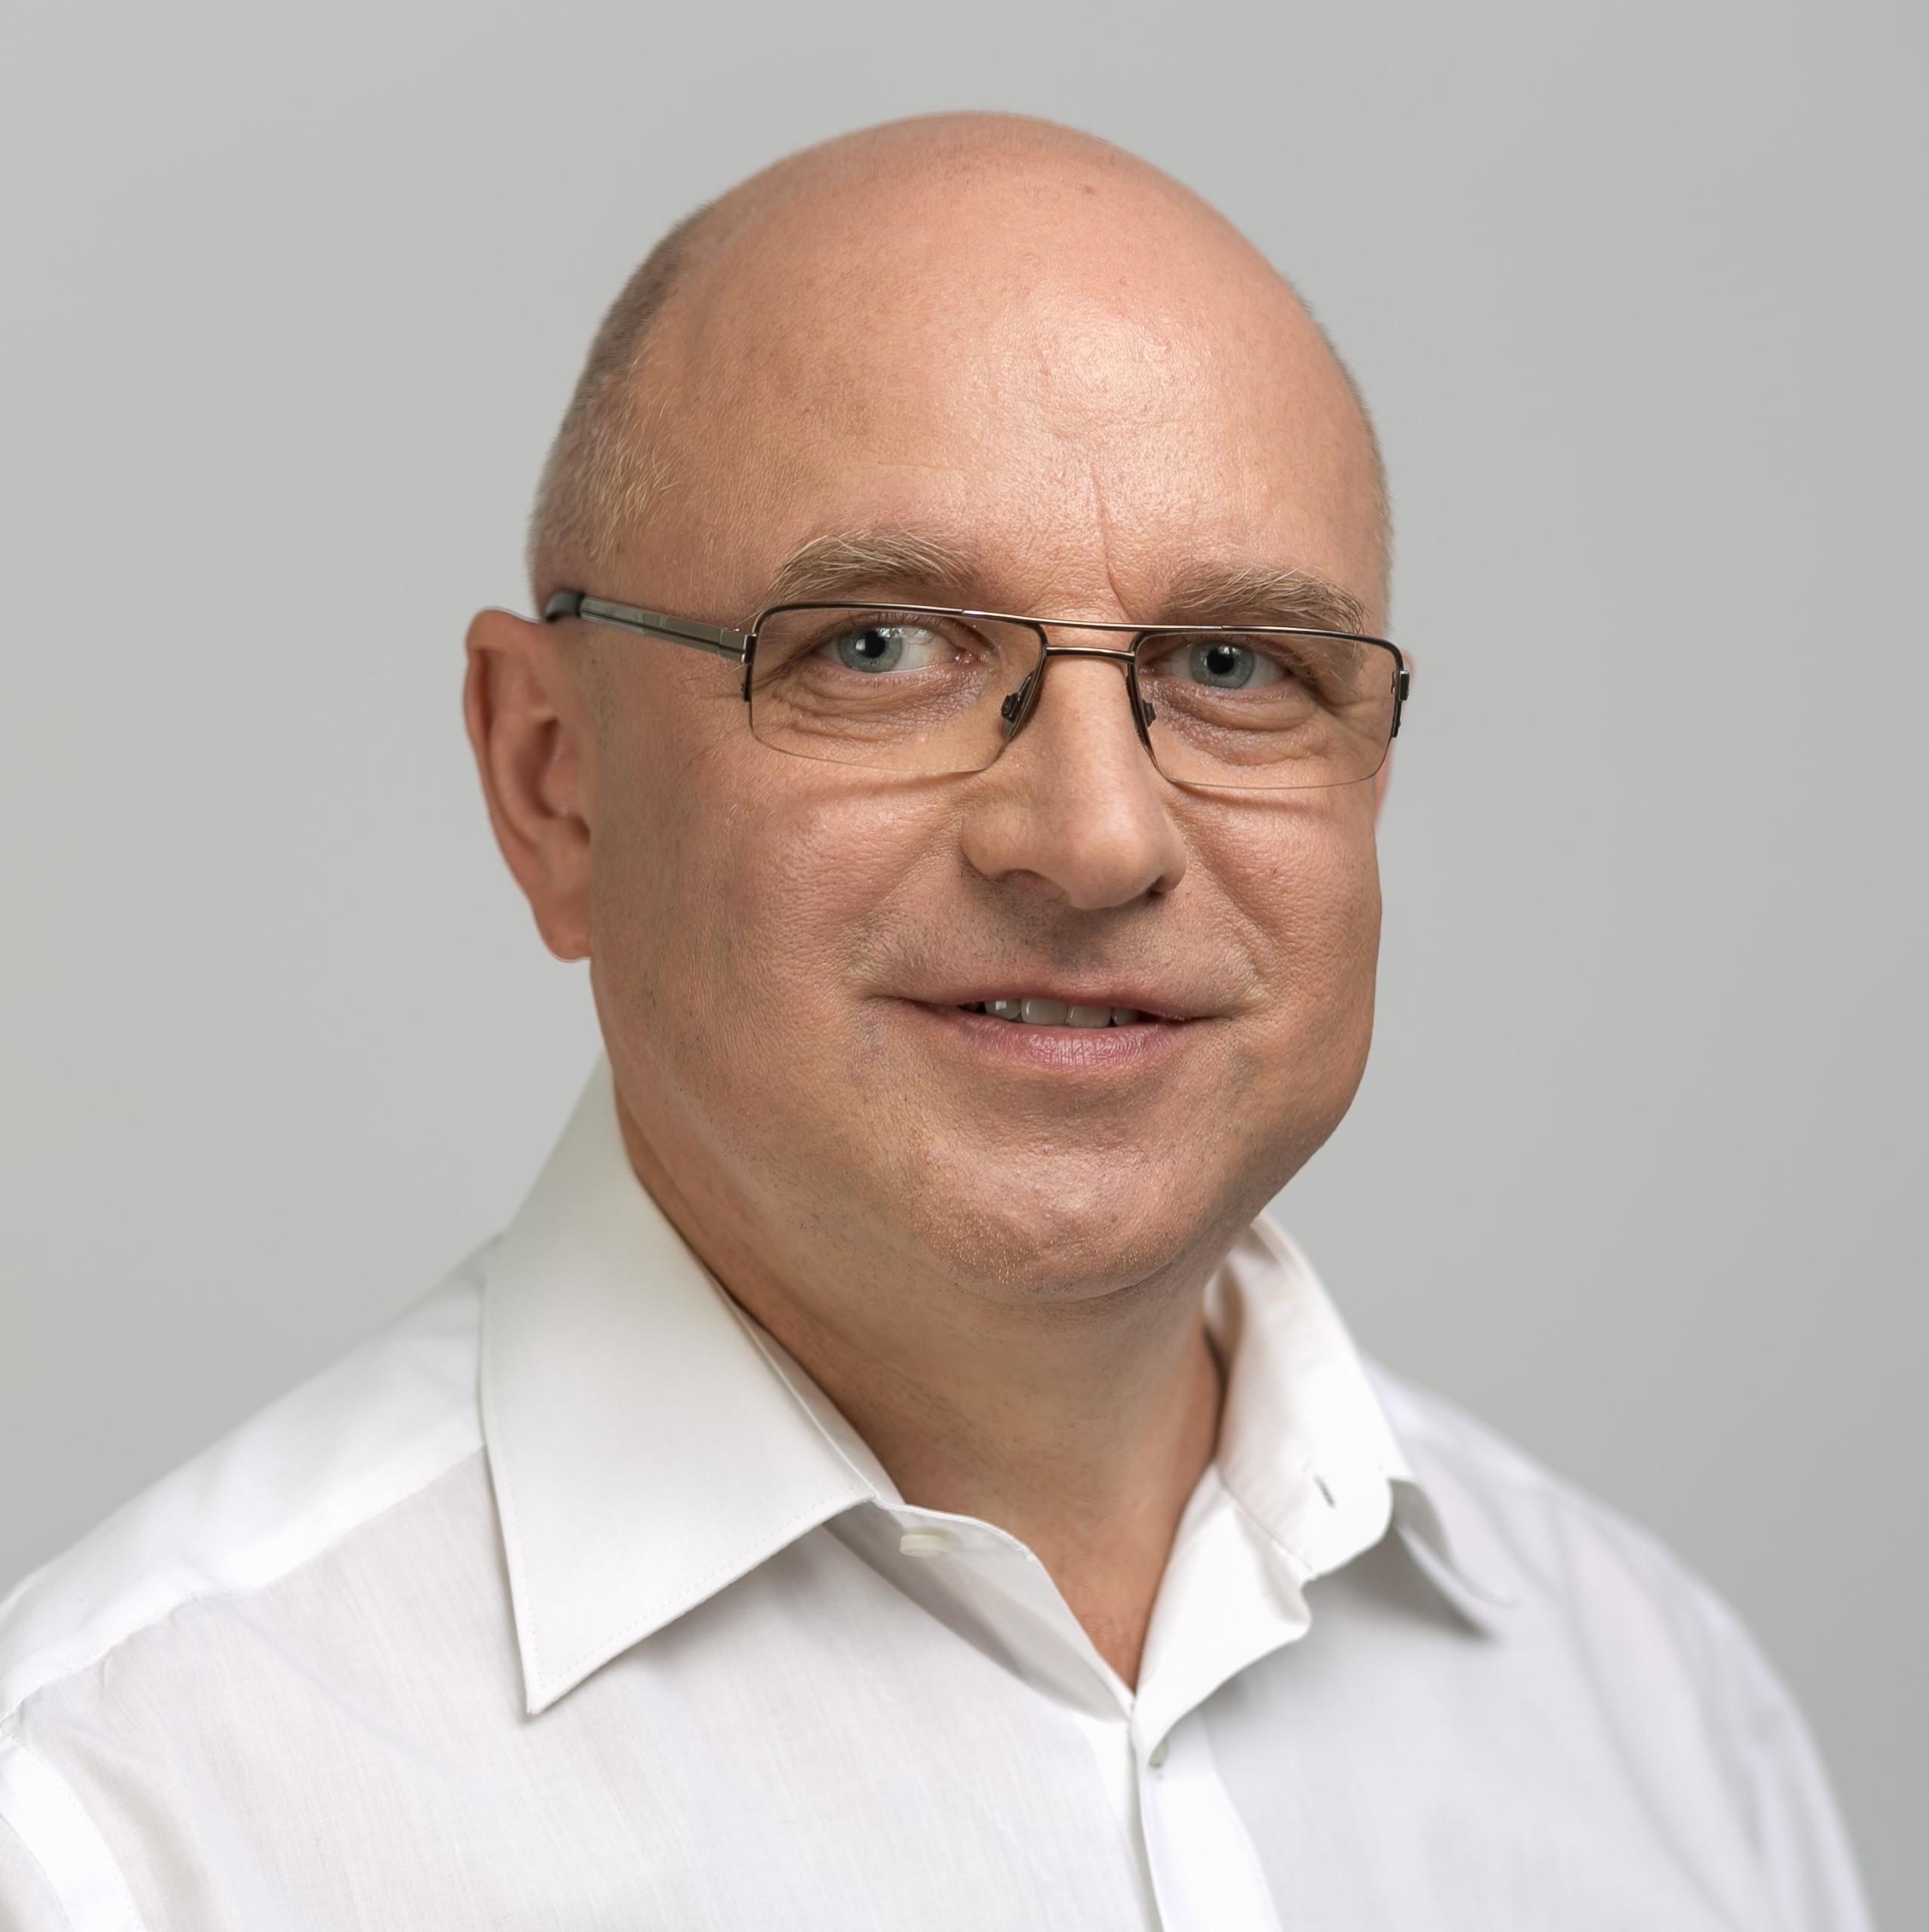 Oleg Limarev